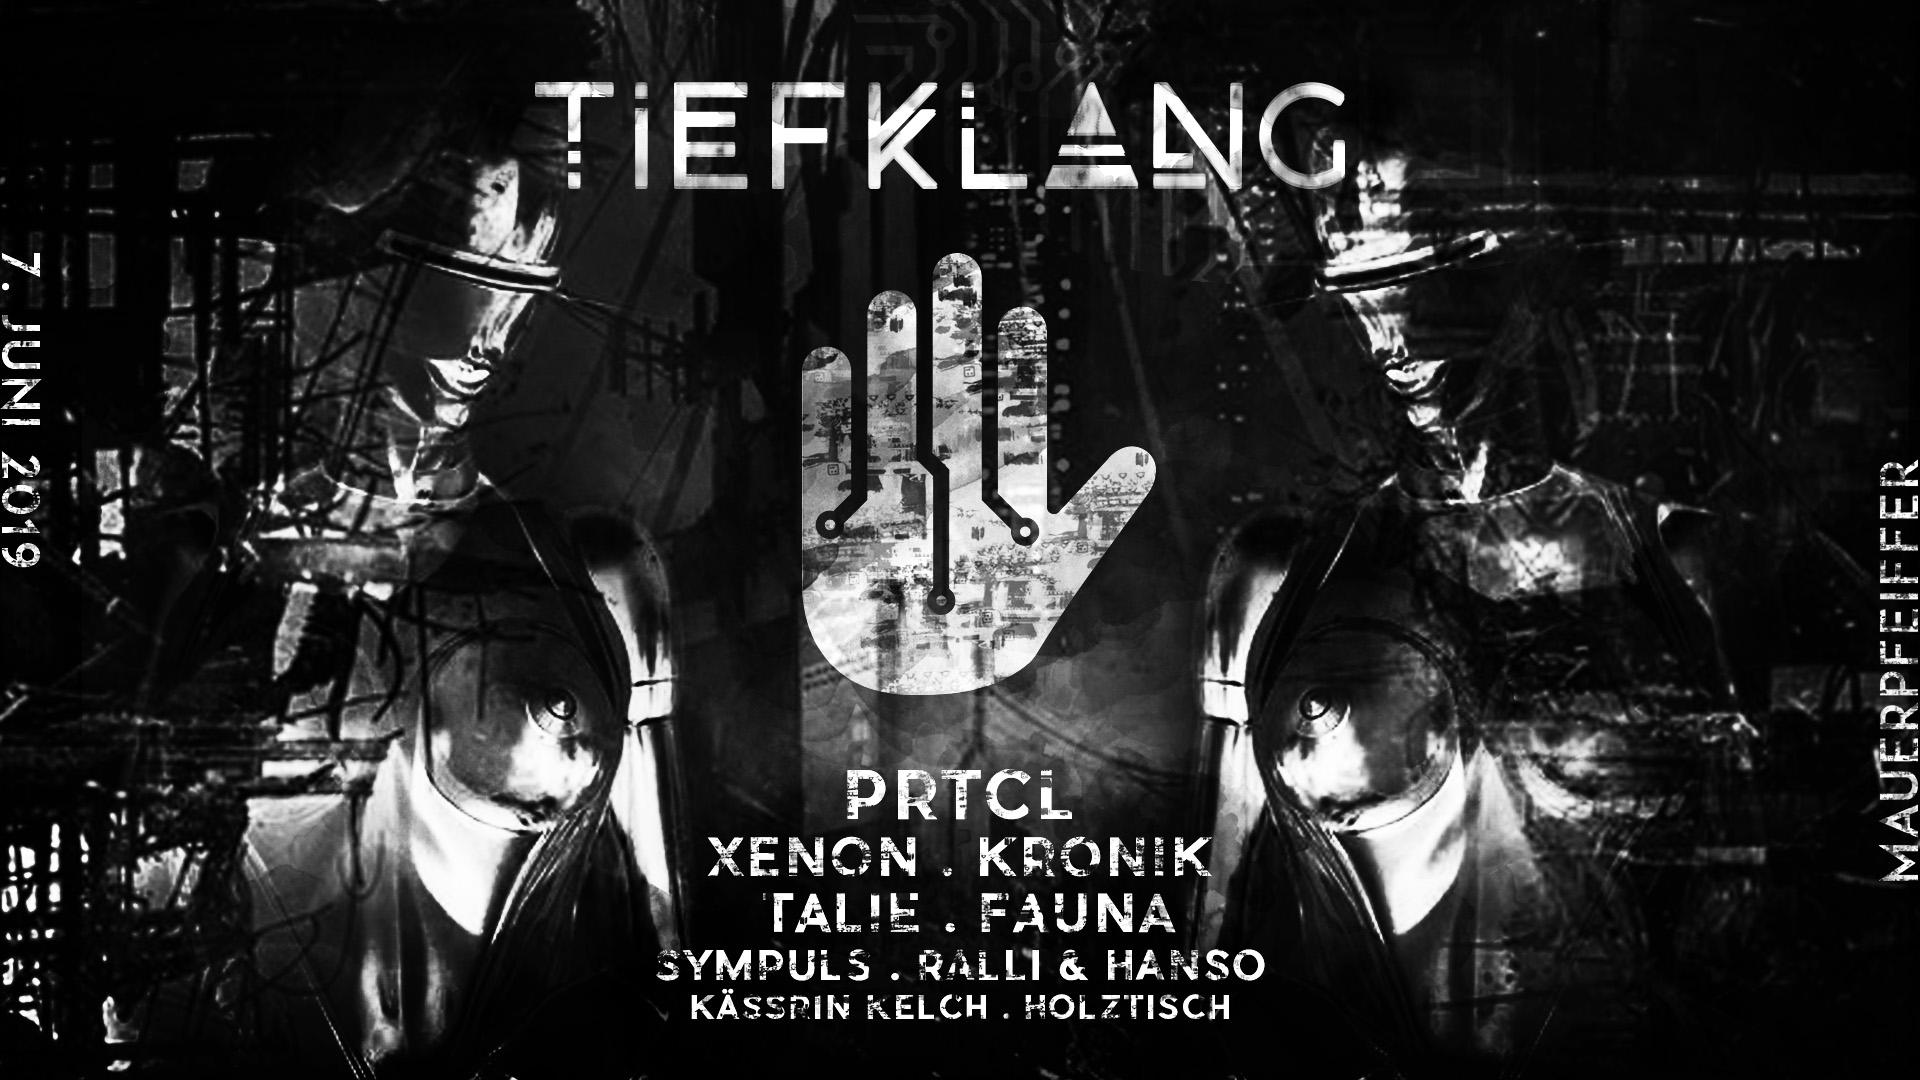 Tiefklang invites Humanoid w/ PRTCL & Xenon